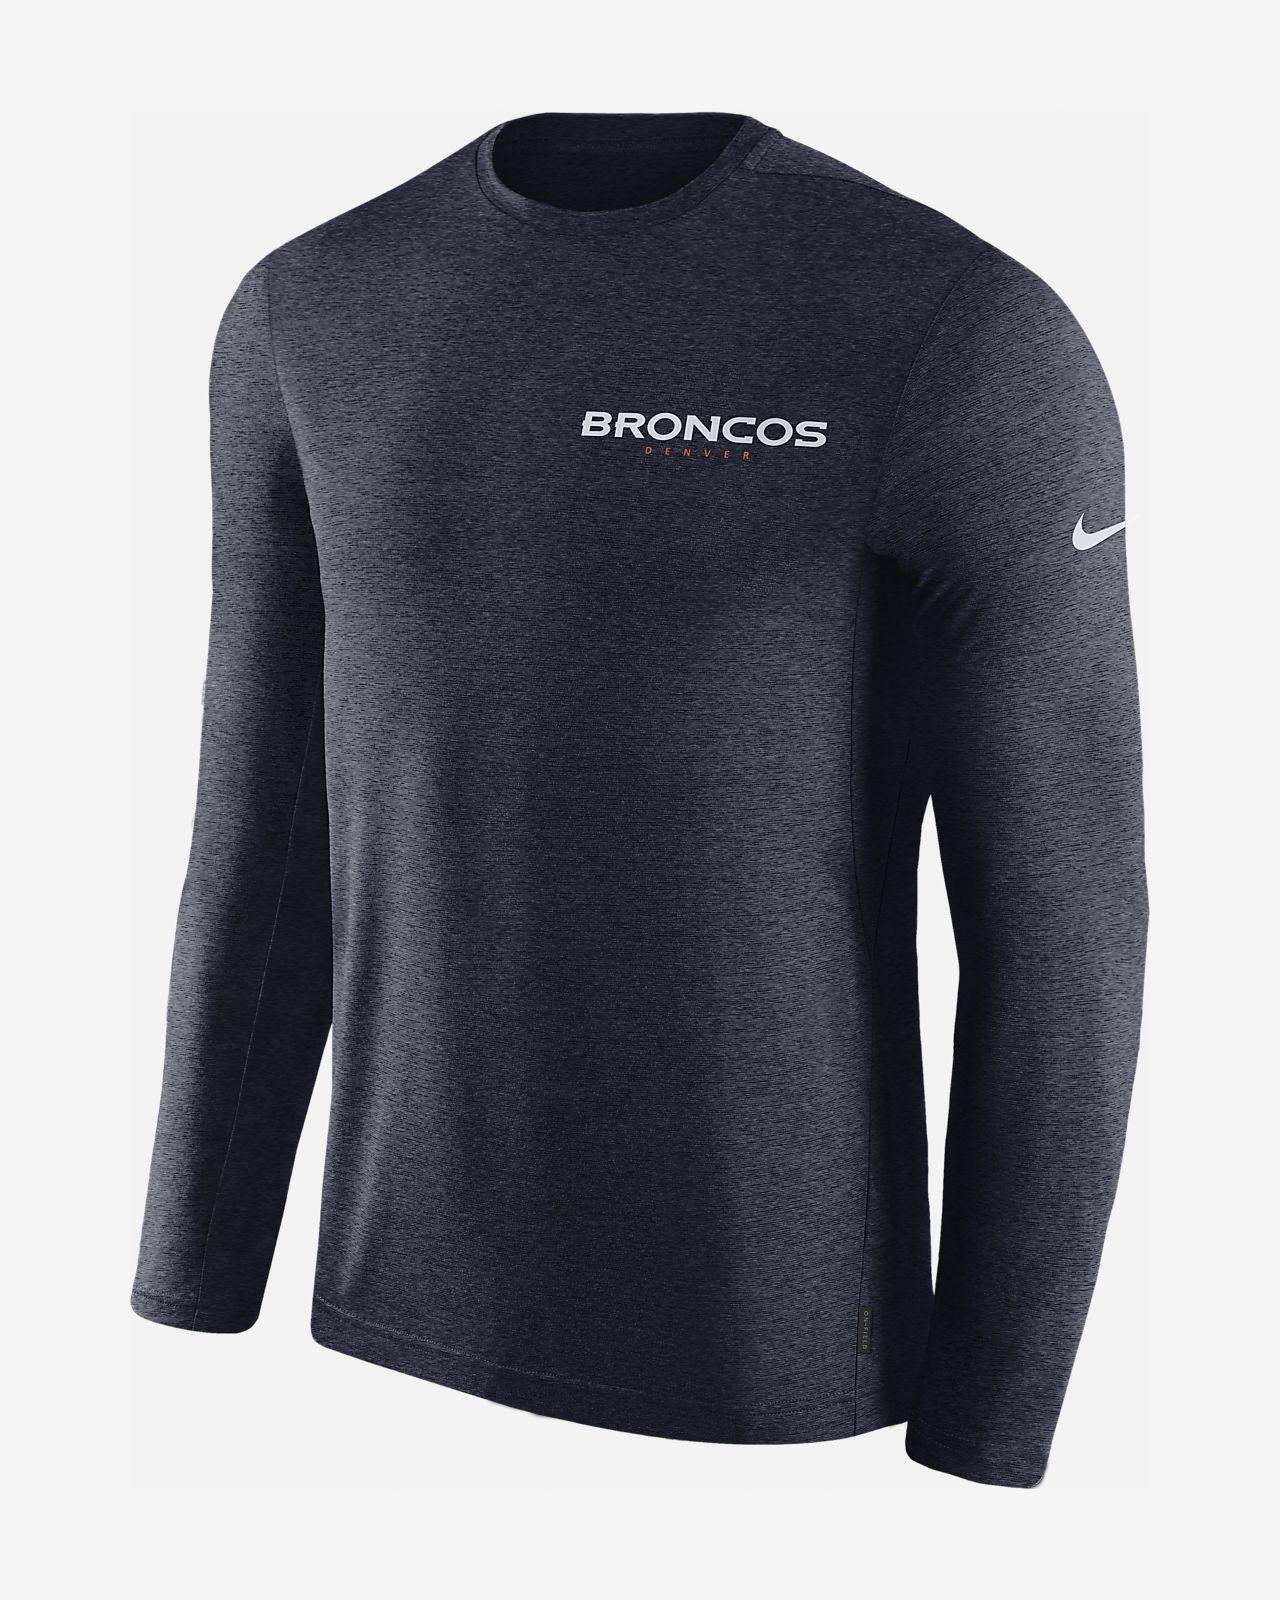 5edae3ae9e78 Nike Dri-FIT Coach (NFL Broncos) Men s Long-Sleeve Top. Nike.com